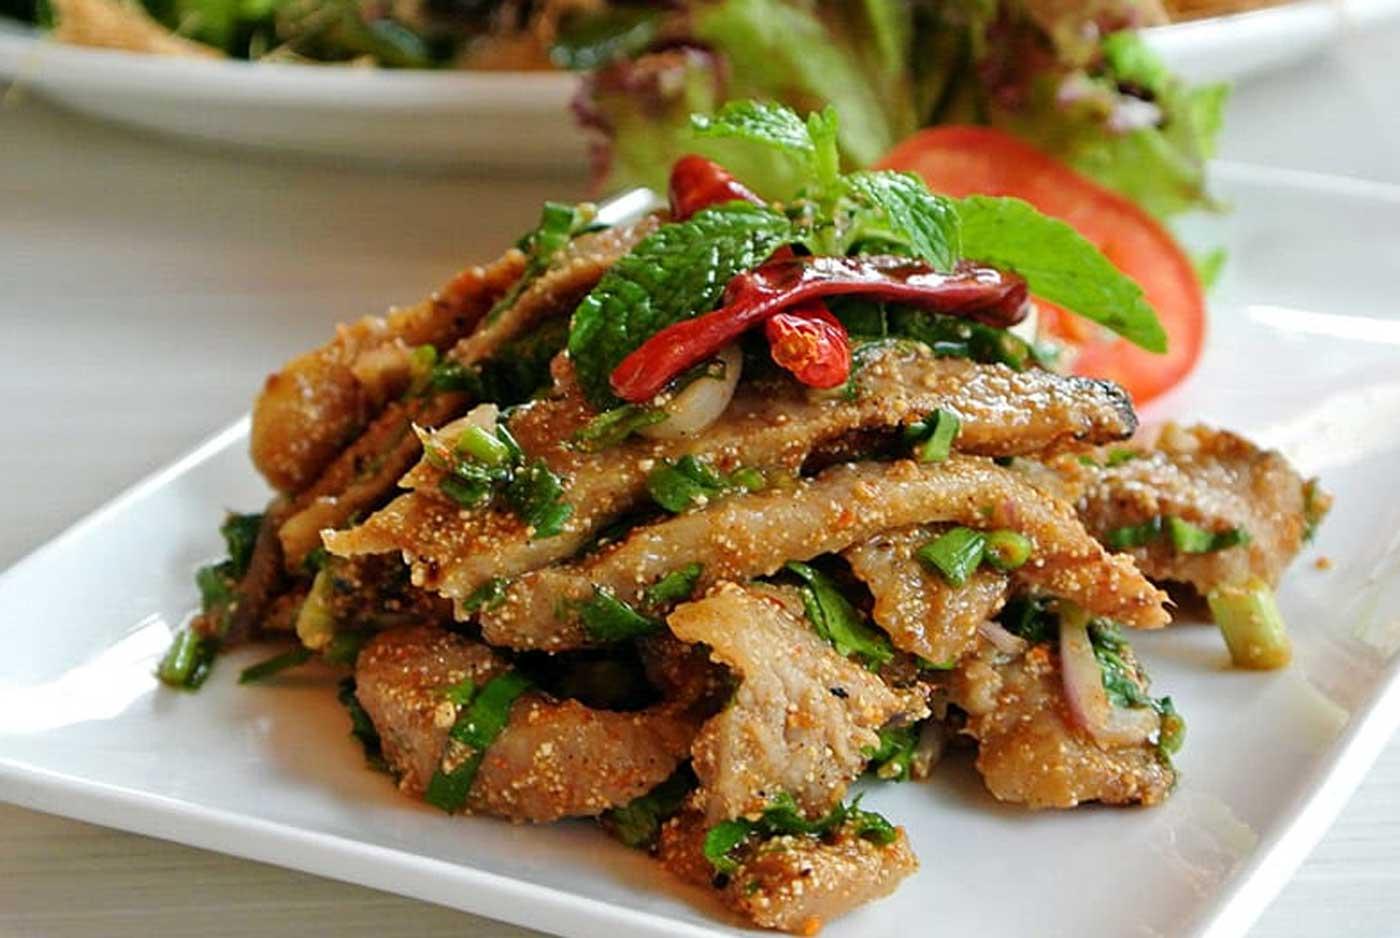 Spicy Grilled Pork Salad